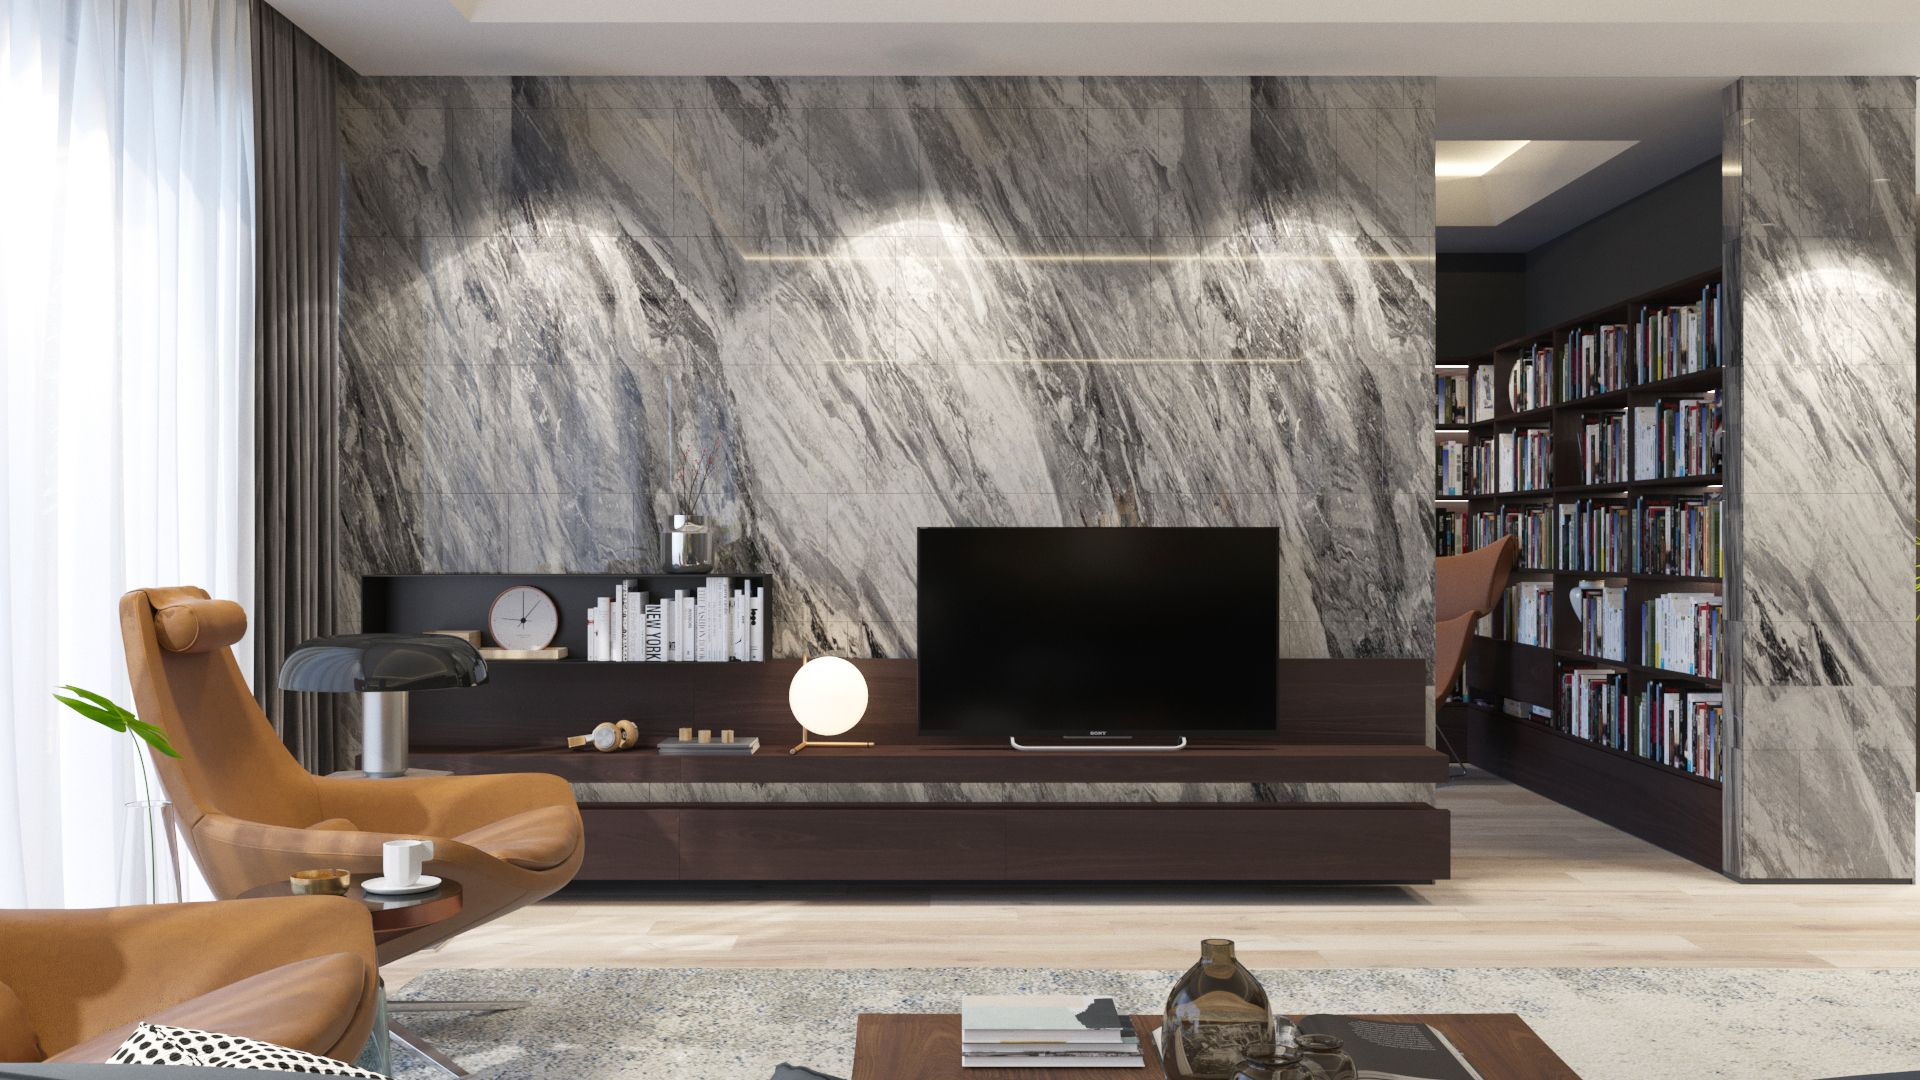 Penthouse In Nairobi On Behance Nairobi Interior Design Living